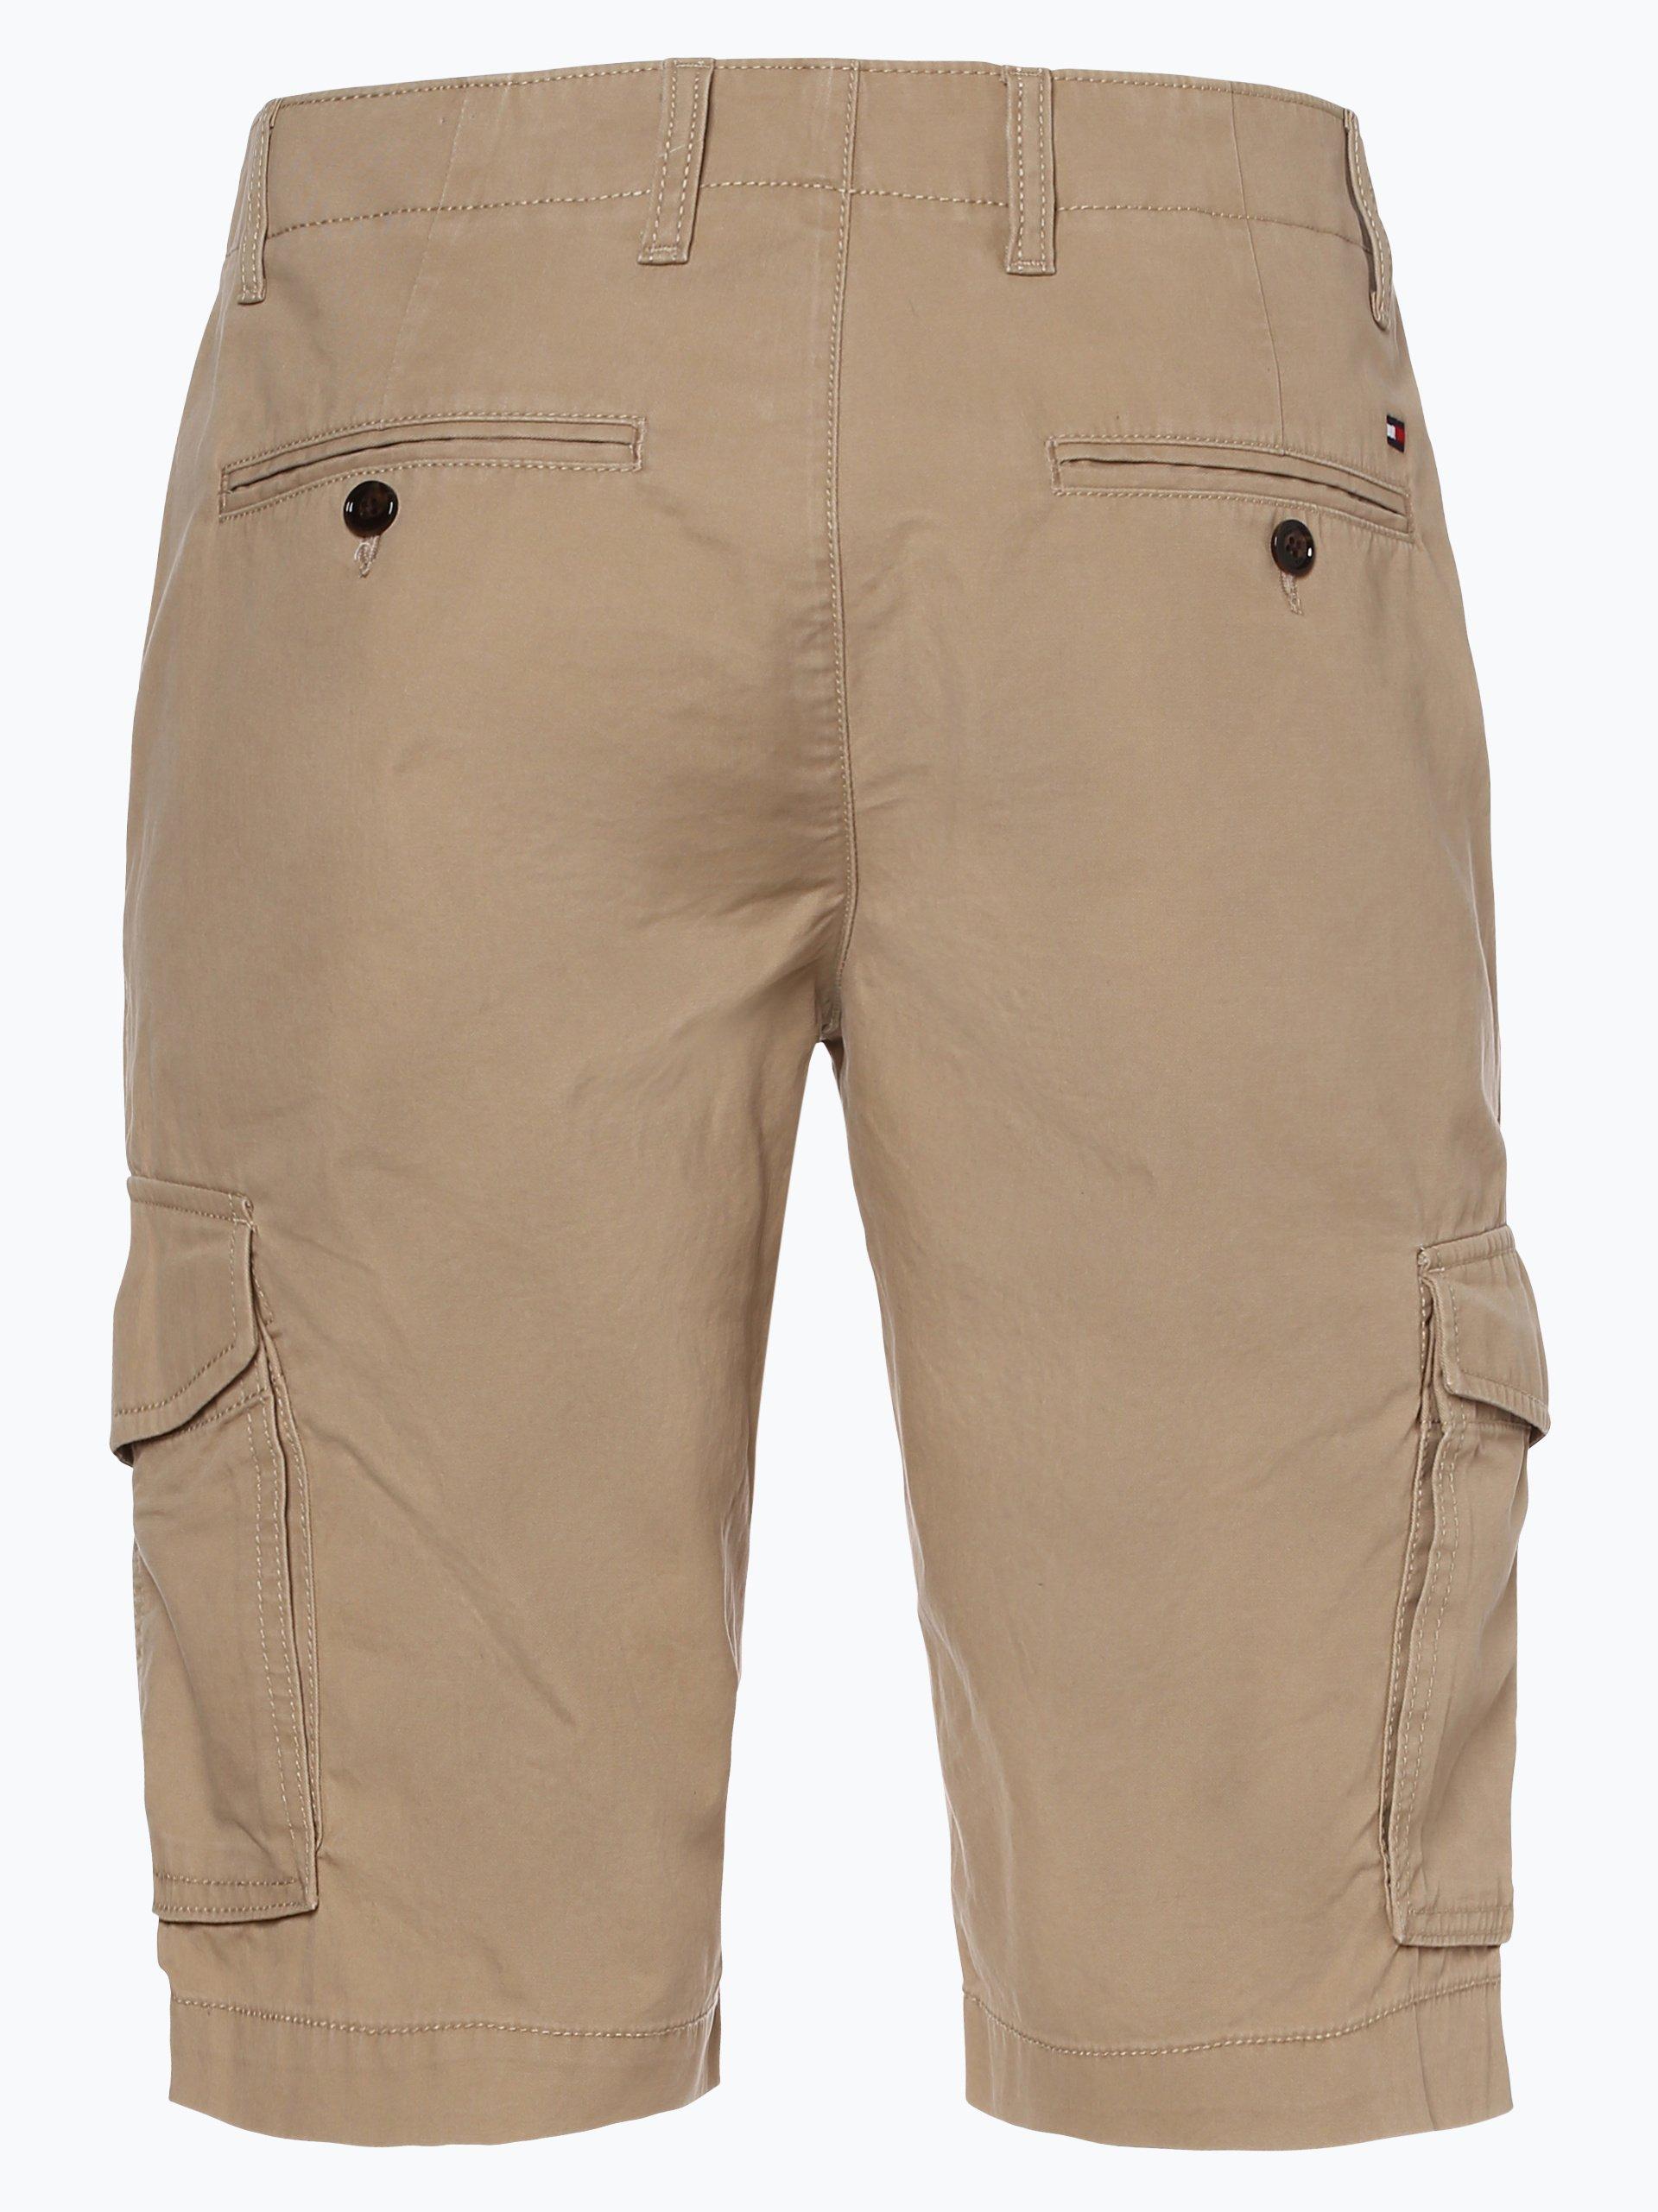 tommy hilfiger herren shorts beige uni online kaufen. Black Bedroom Furniture Sets. Home Design Ideas